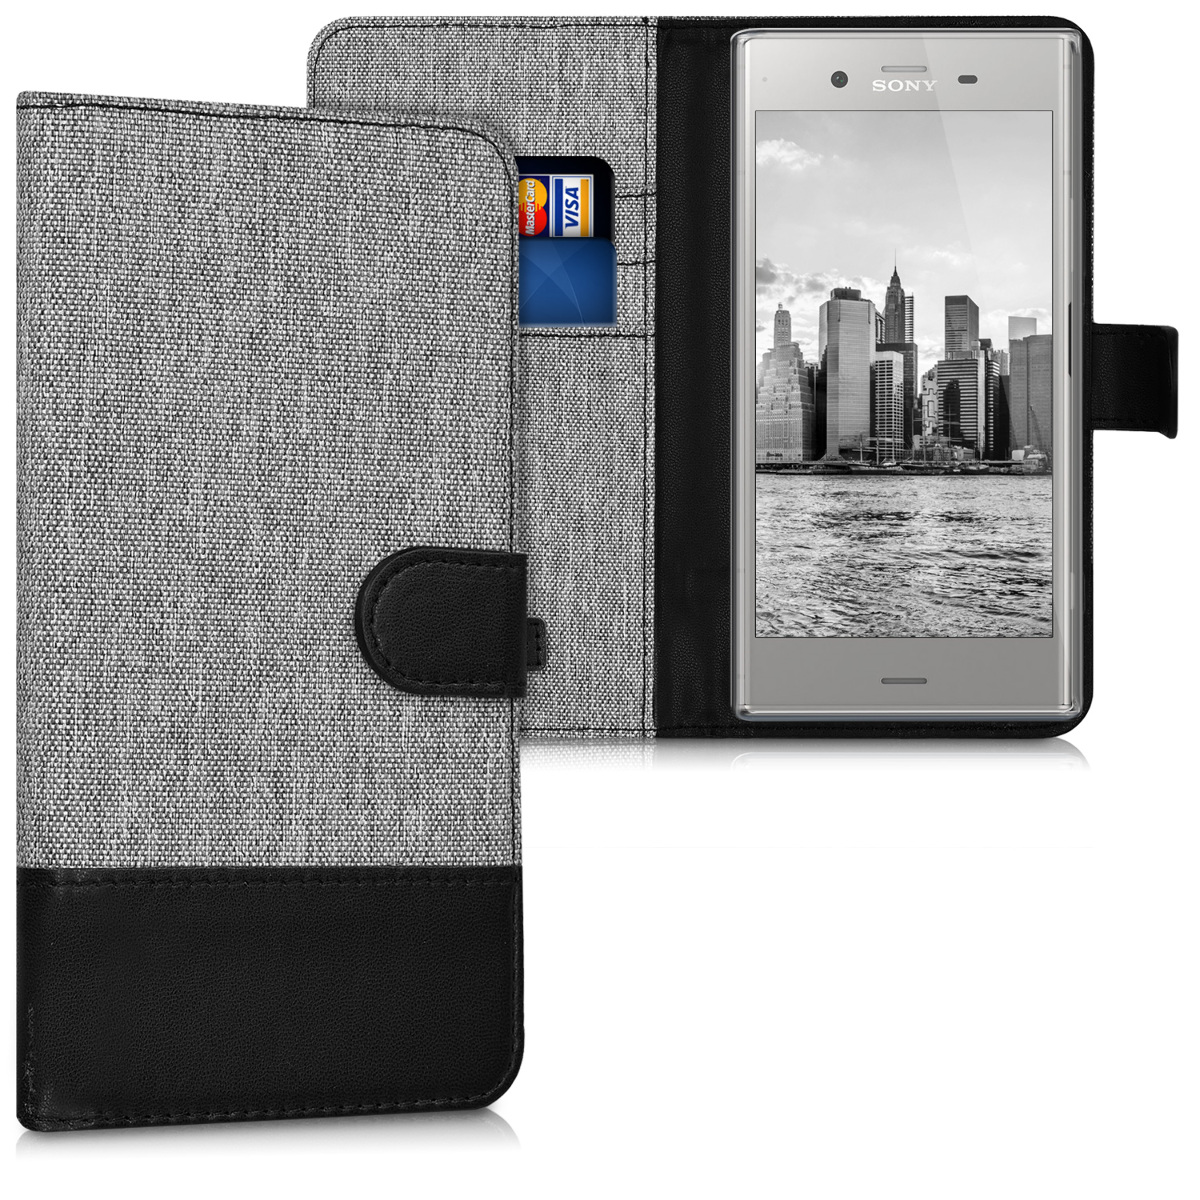 KW Θήκη Πορτοφόλι Sony Xperia XZ1 - Συνθετικό δέρμα - Grey / Black (42922.22)